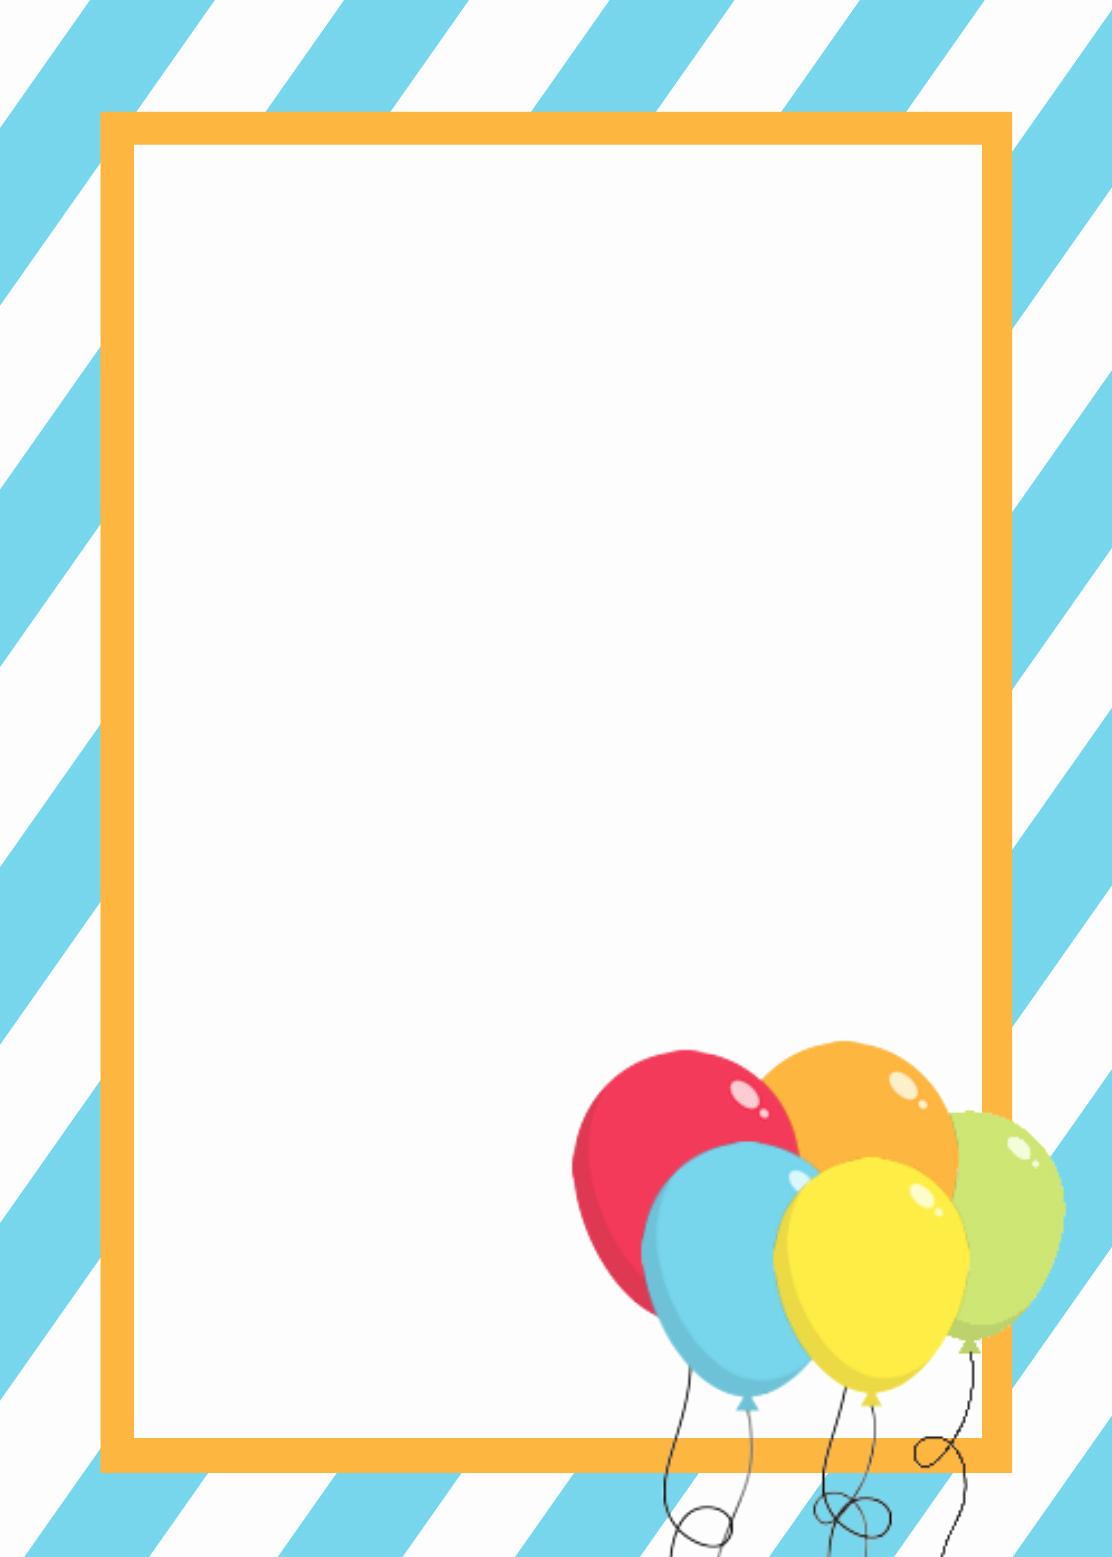 Free Printable Birthday Invitation Templates Unique Free Printable Birthday Invitation Templates